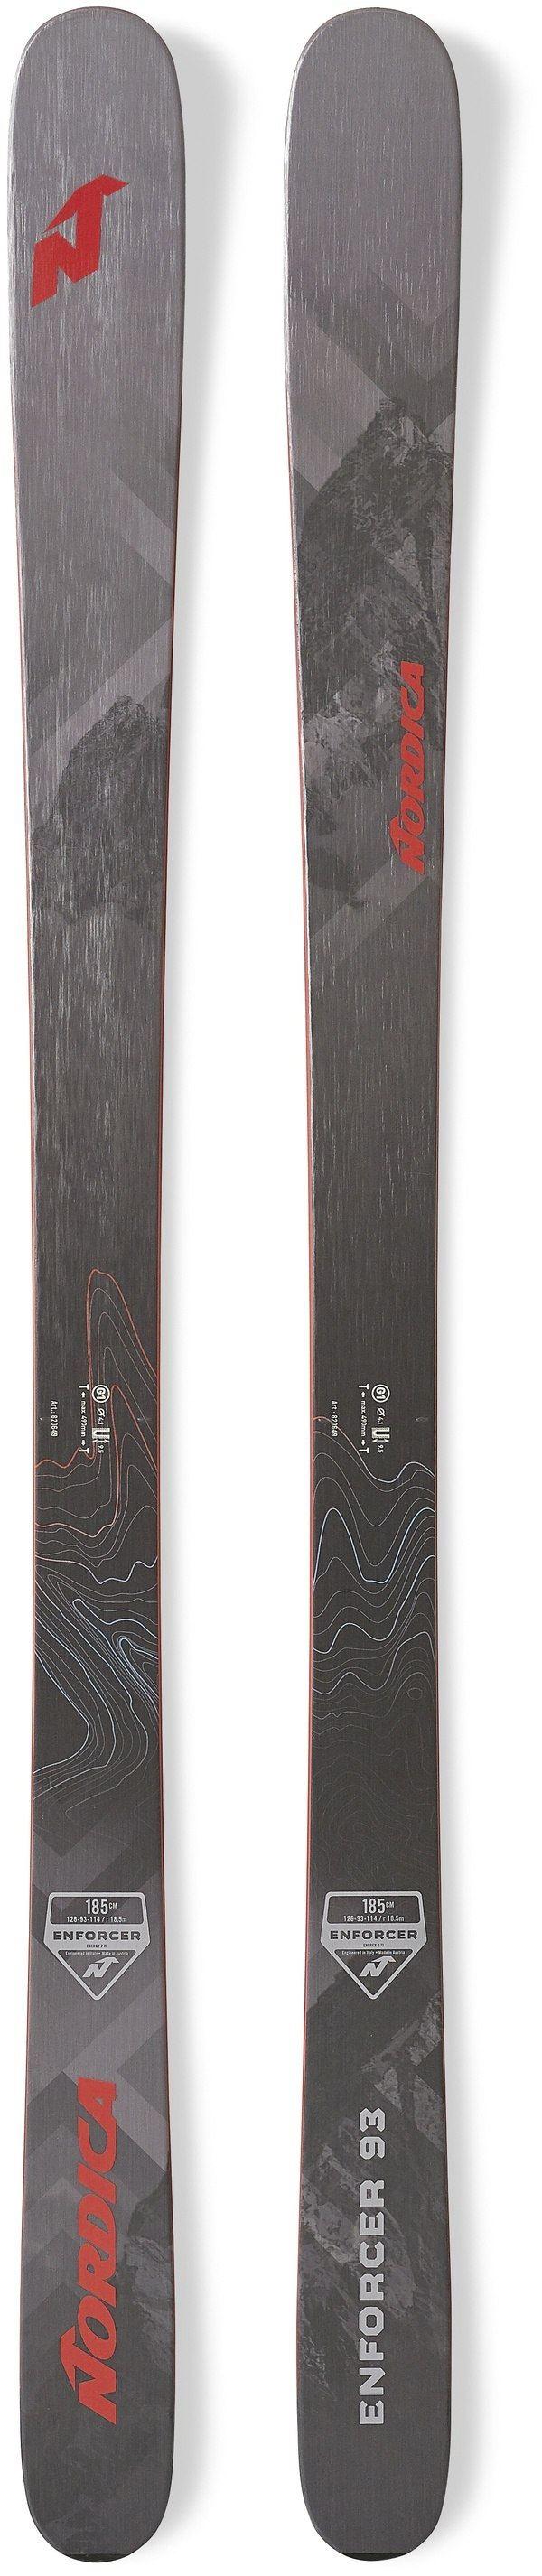 Flat Herren-Freeski Freeride-Ski Free-Ski Powderski Nordica Enforcer 93